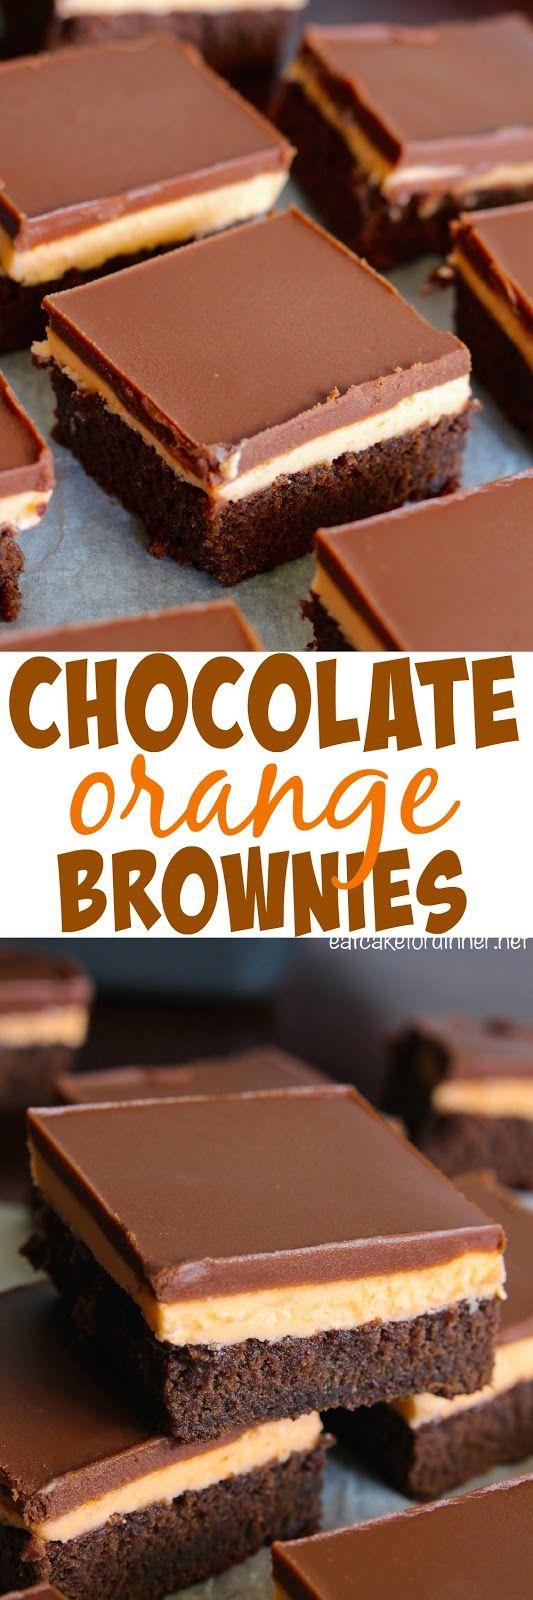 Eat Cake For Dinner: Chocolate Orange Brownies